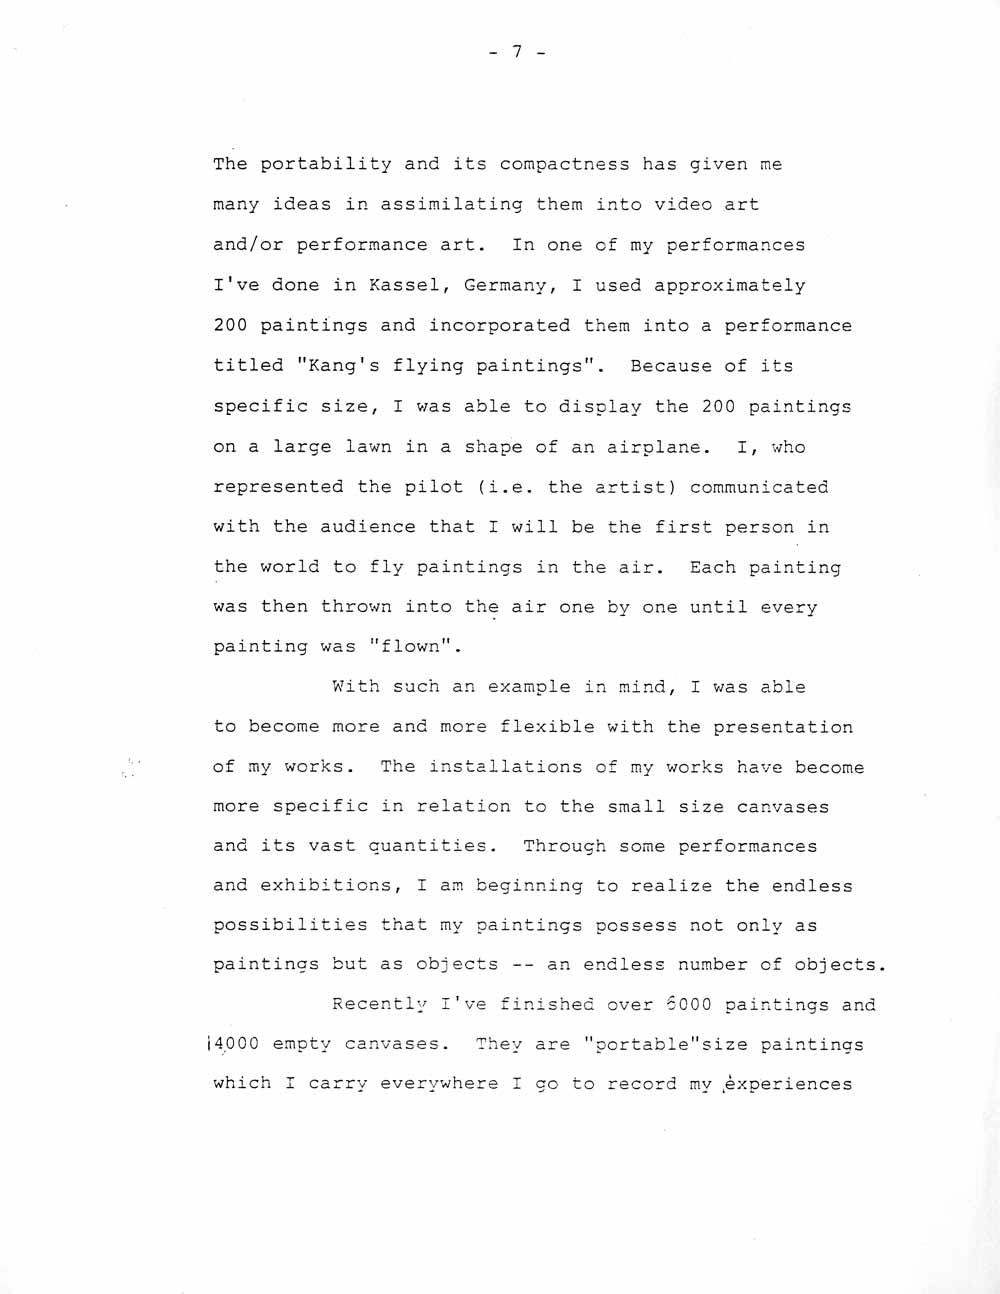 Ik-Joong Kang's Artist Statement, pg 7